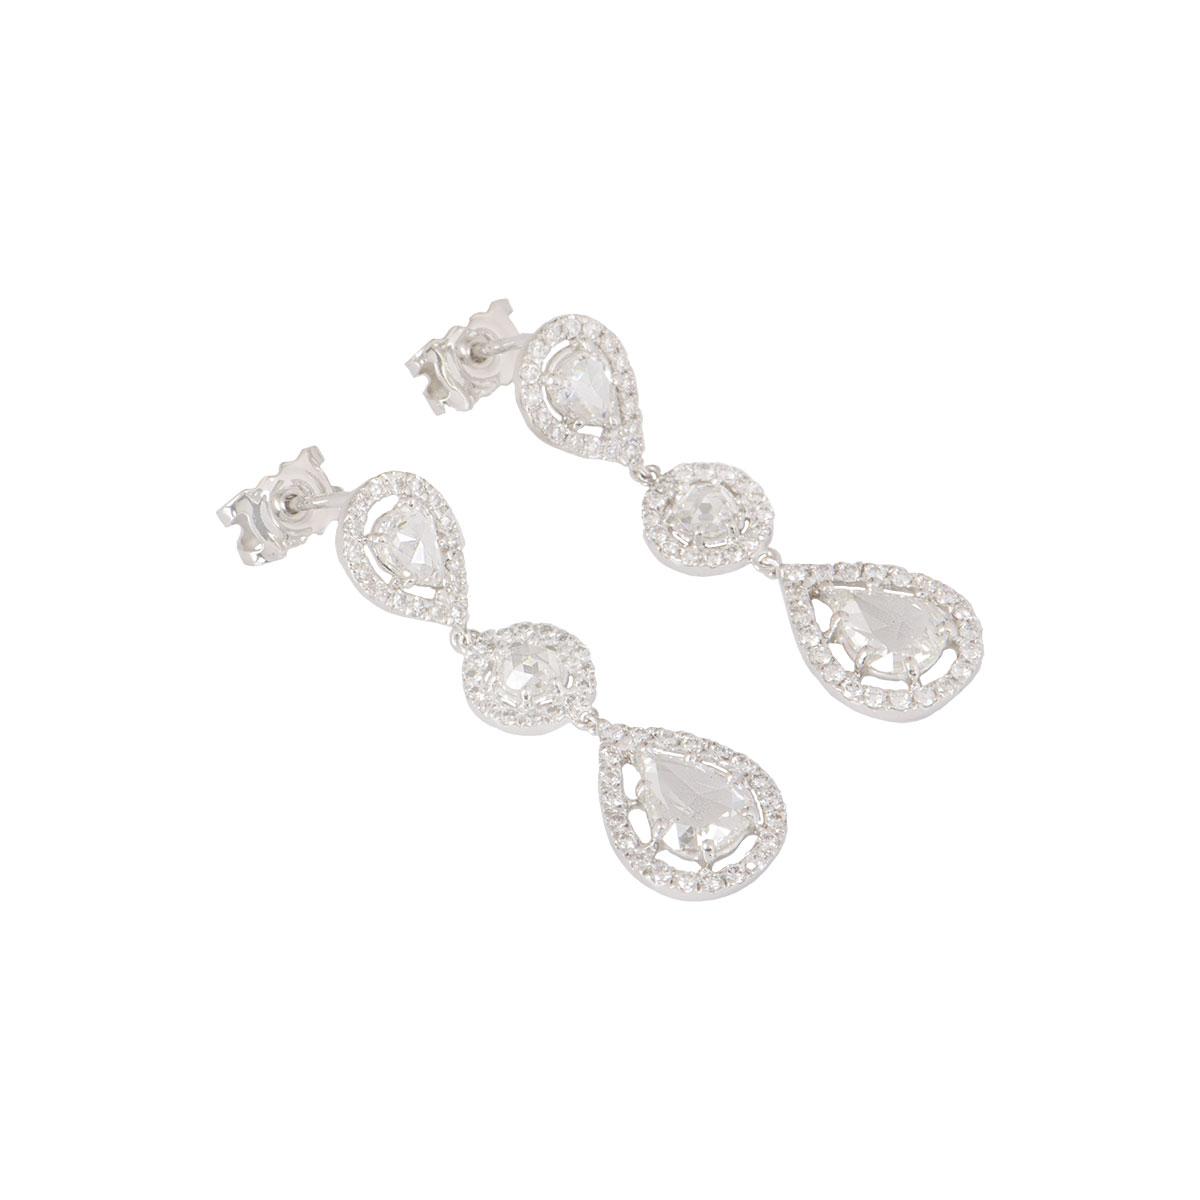 White Gold Rose Cut Diamond Drop Earrings